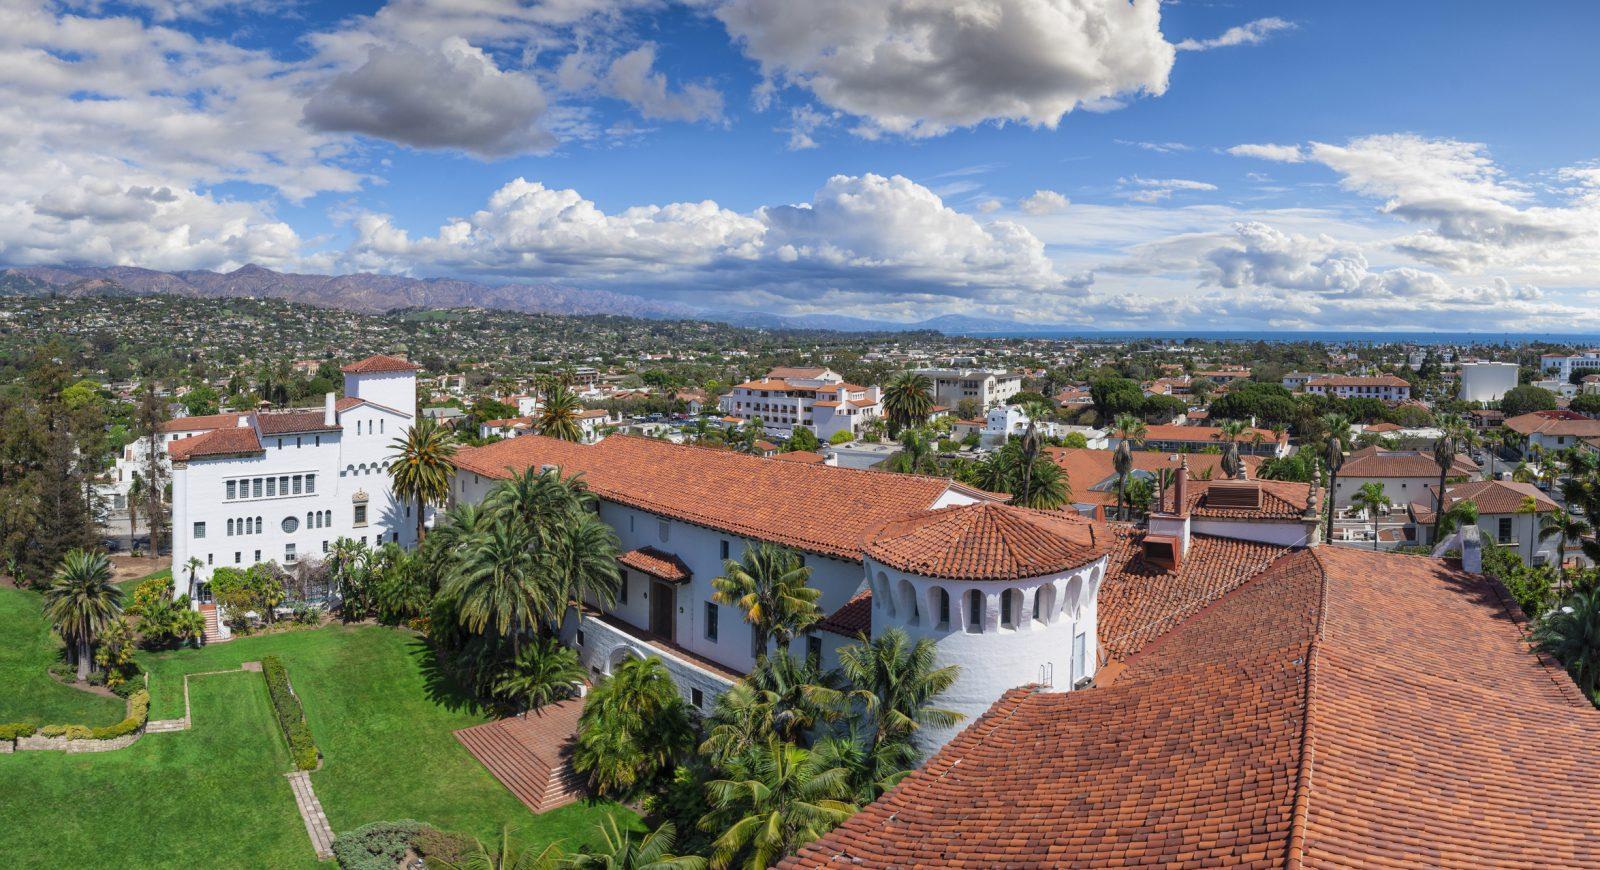 A vista of Santa Barbara